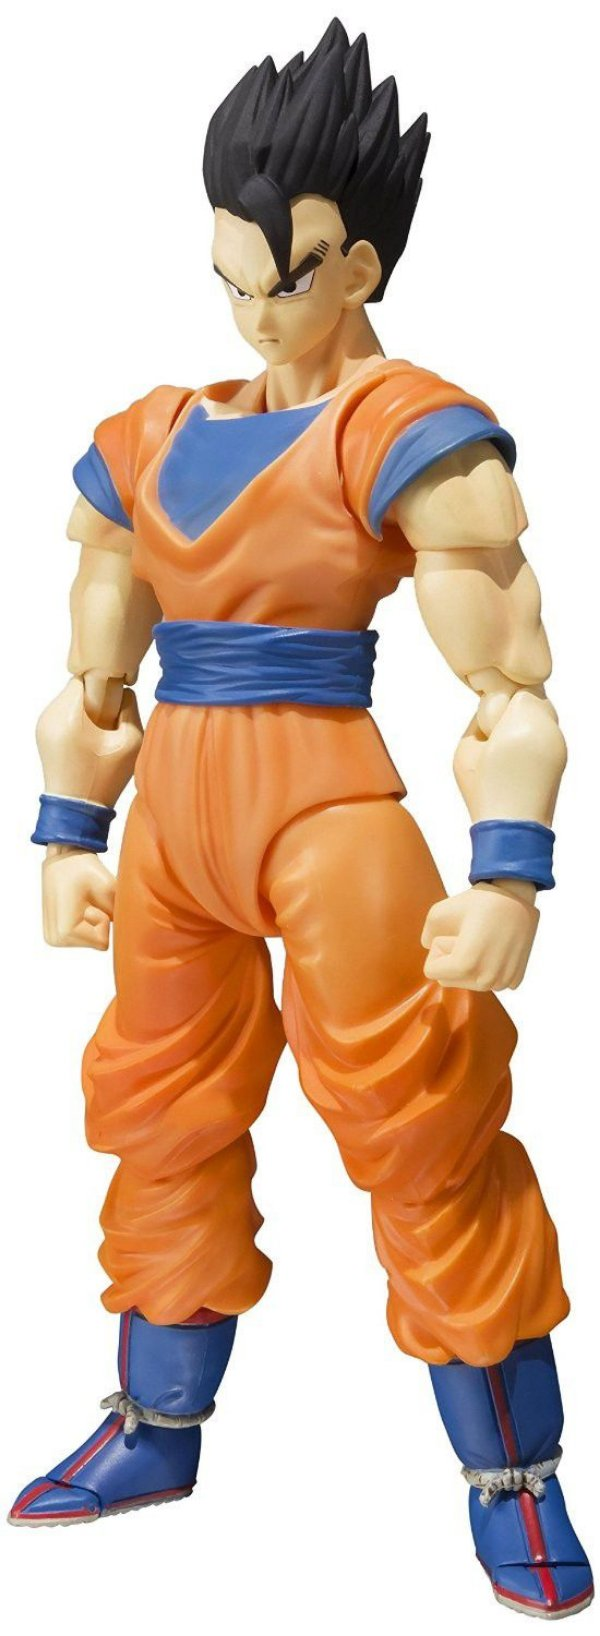 Ultimate Son Gohan Dragon Ball Z - S.H. Figuarts - Bandai